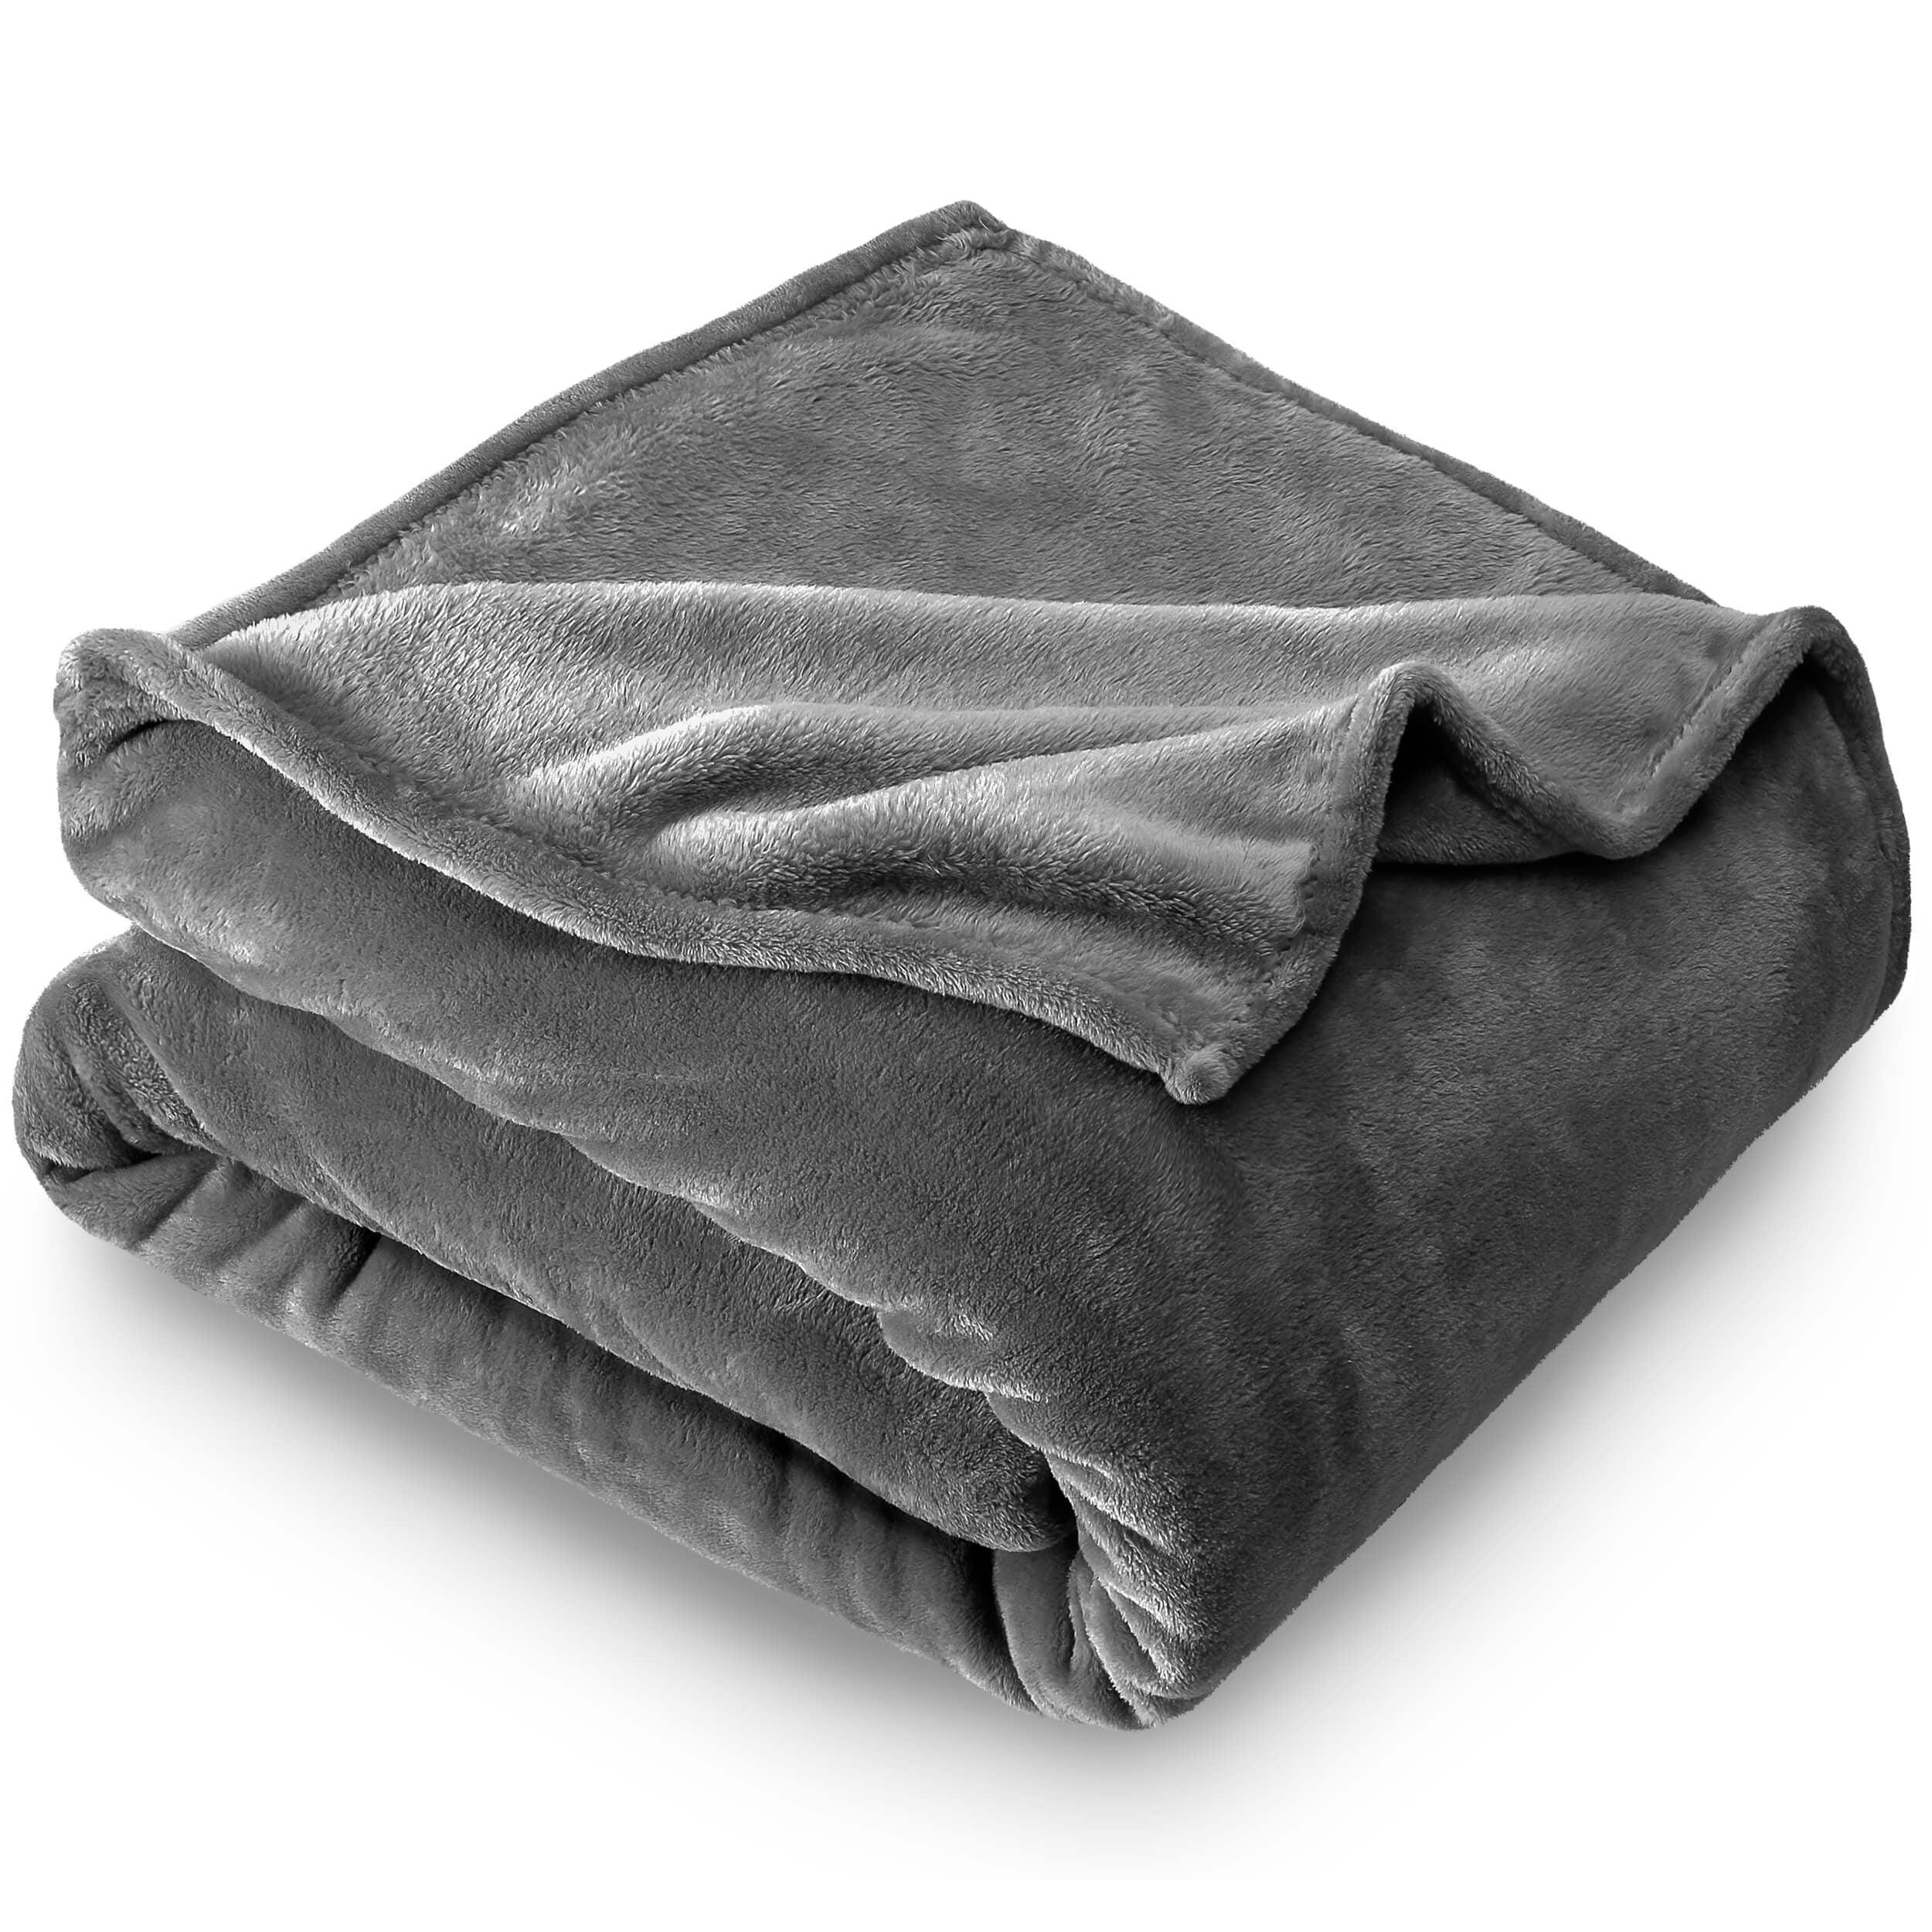 Bare Home Ultra Soft Microplush Velvet Blanket Luxurious Fuzzy Fleece Fur All Season Premium Bed Blanket Full Queen Gray Walmart Com Walmart Com